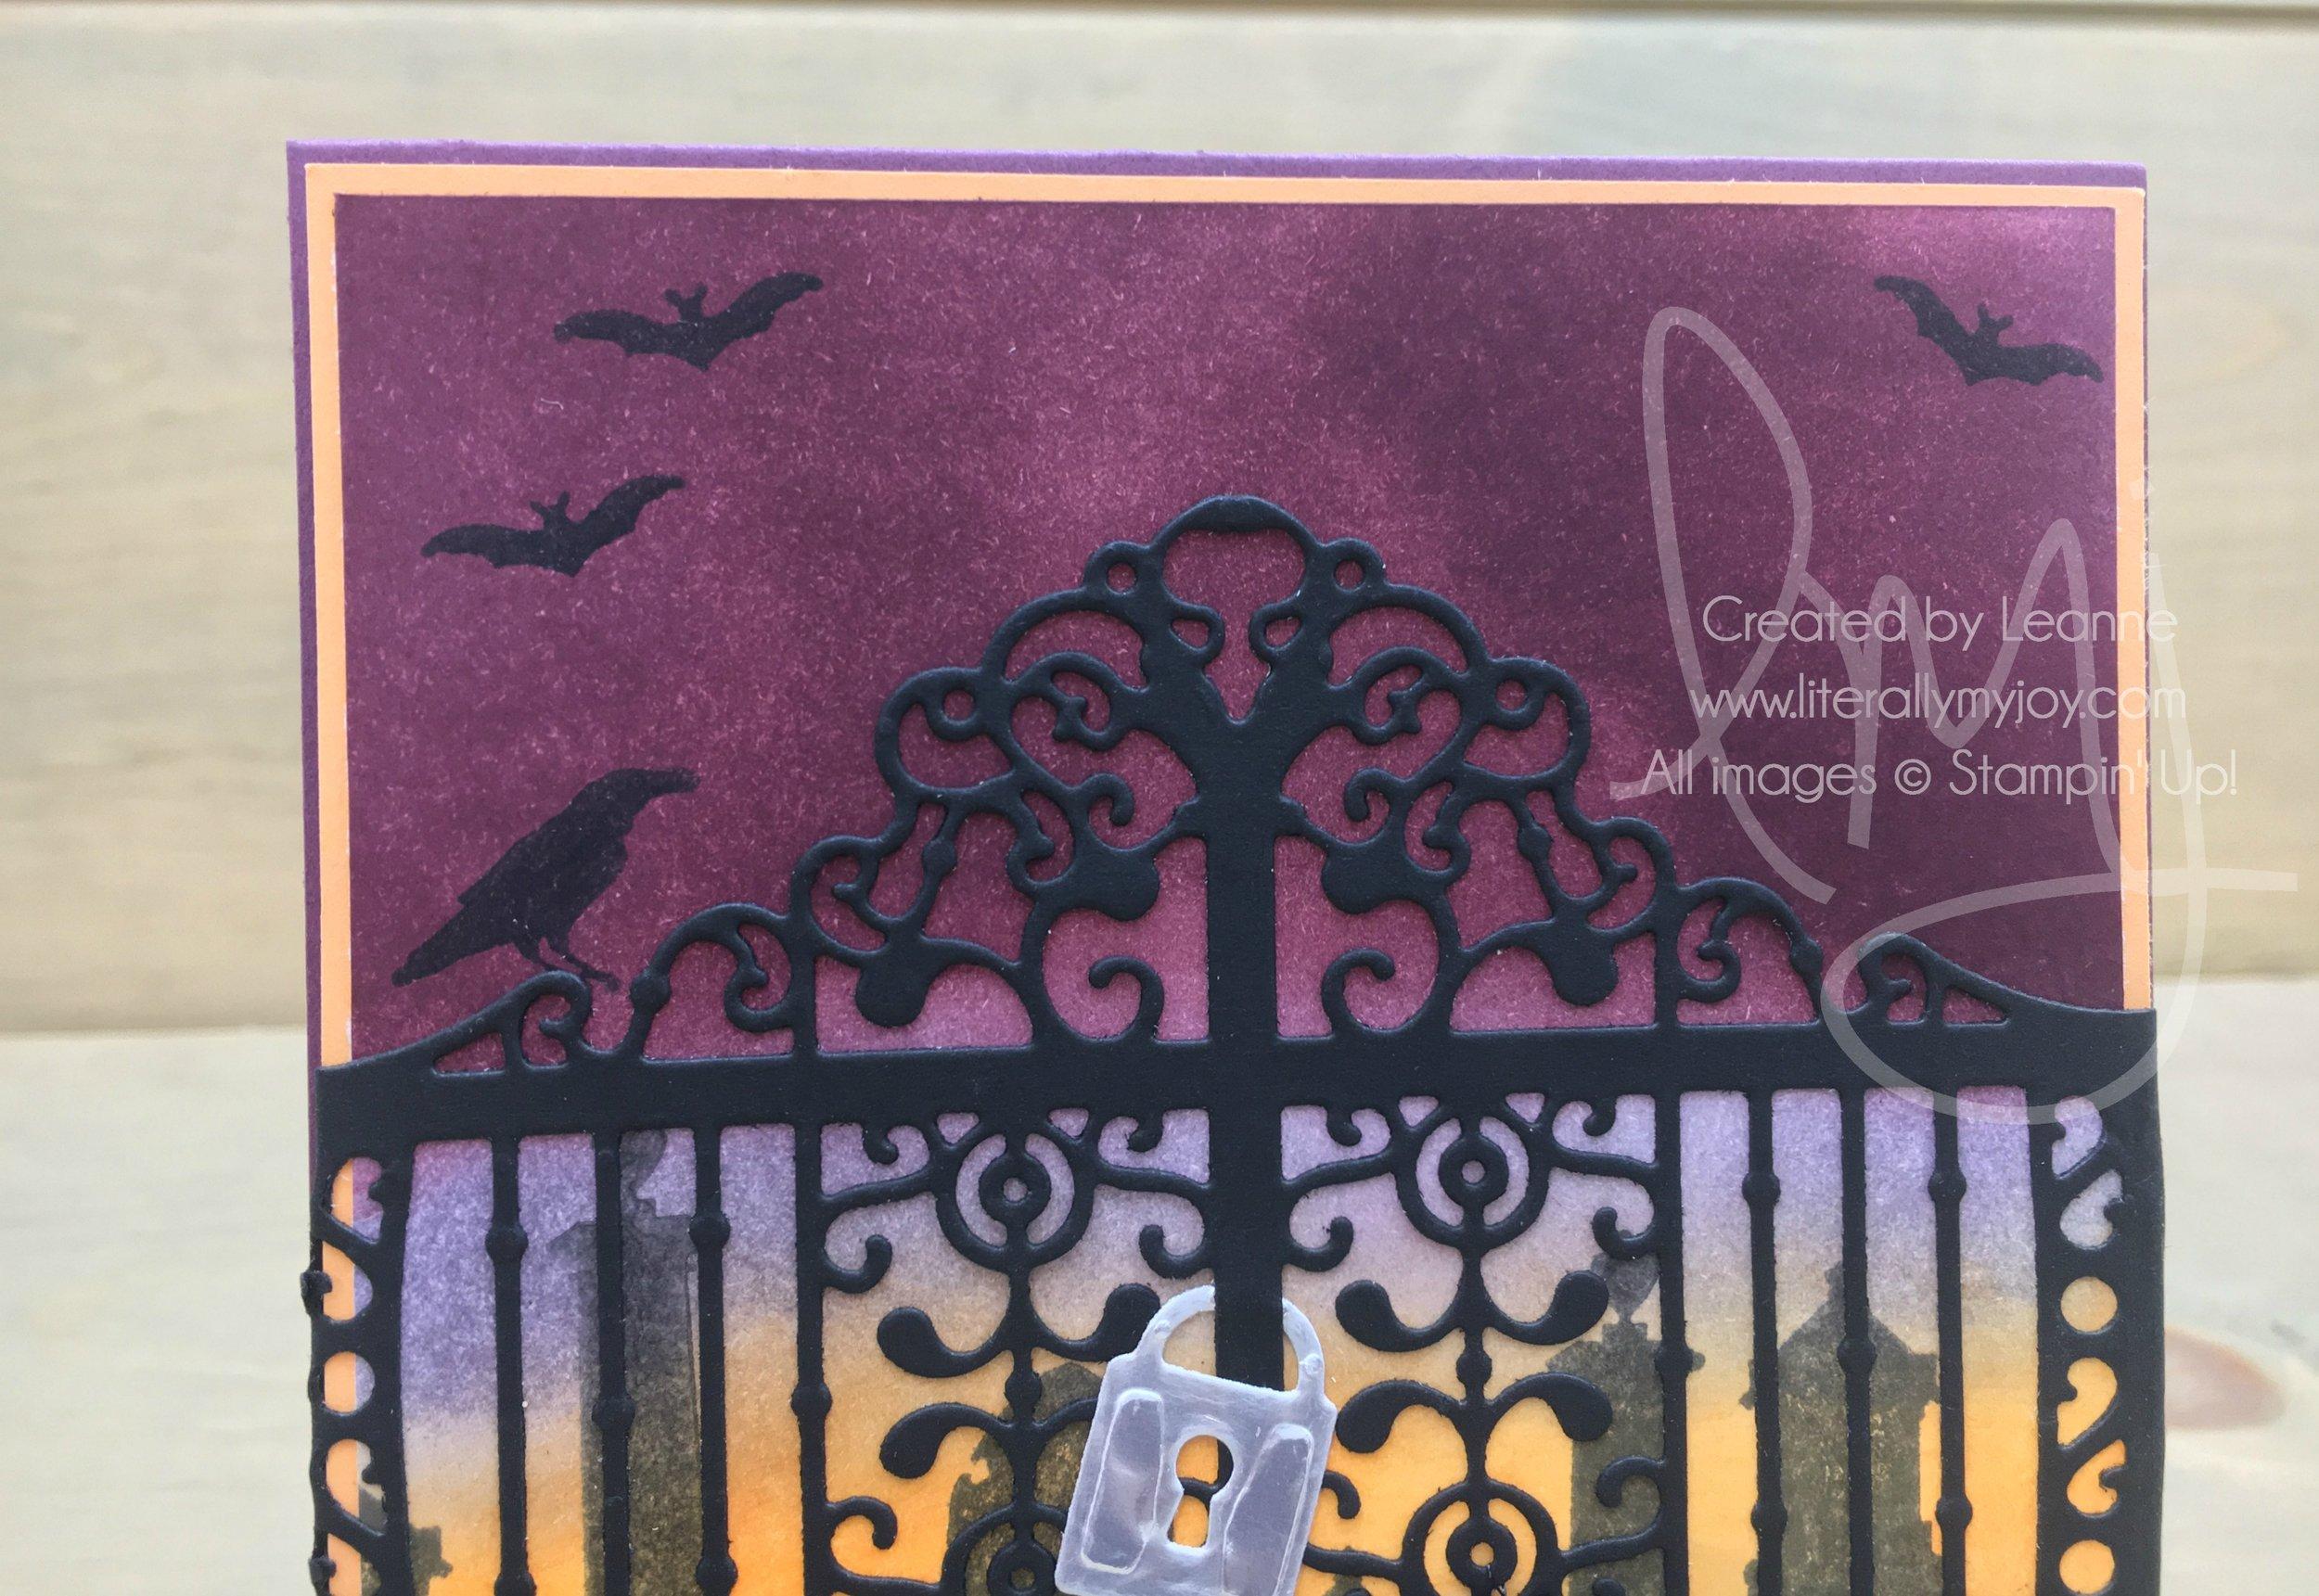 Raven and bats.jpg